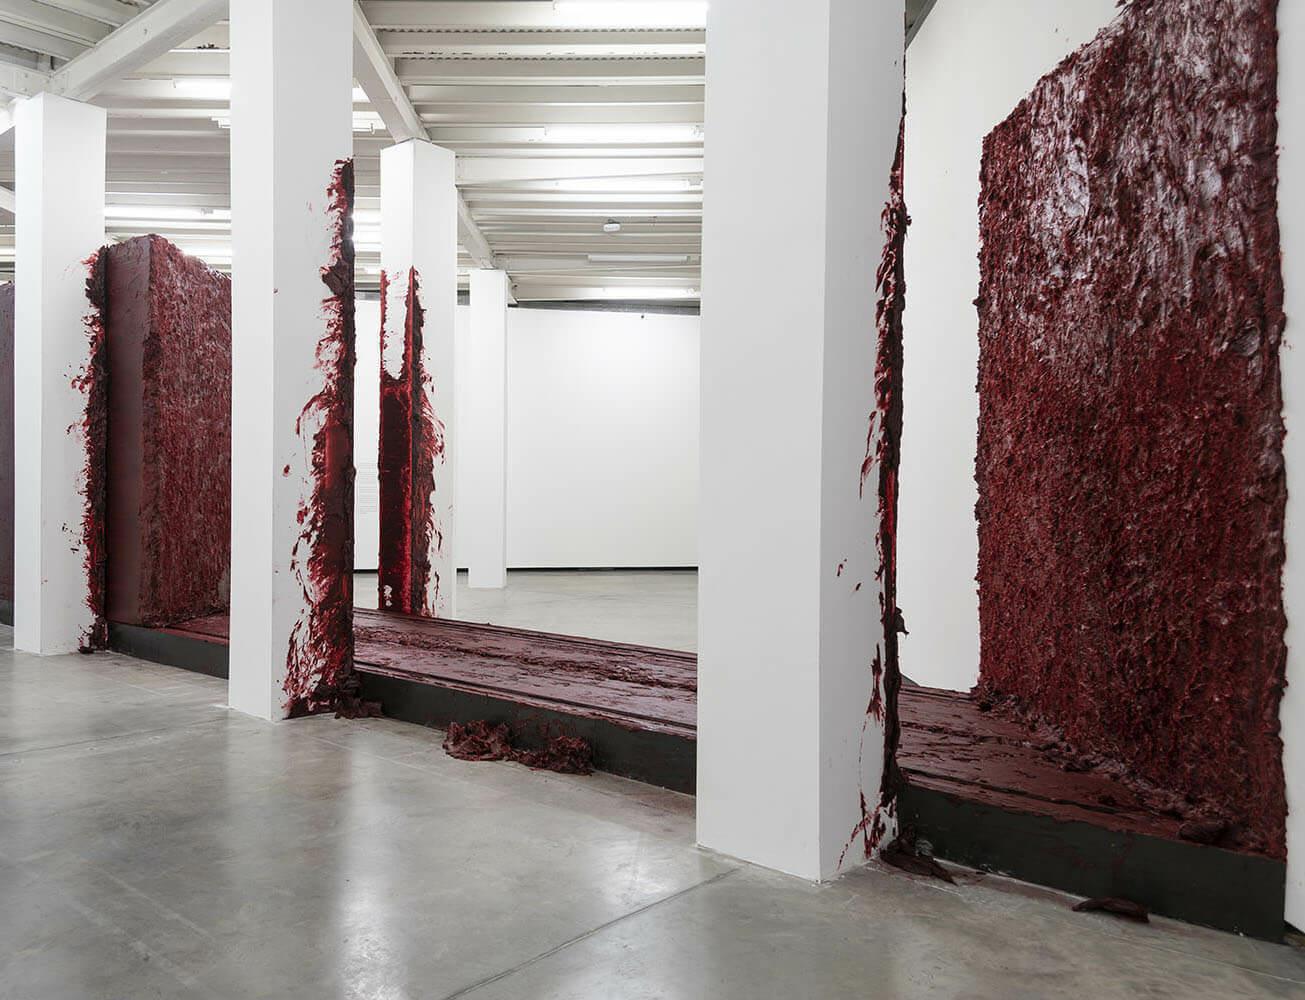 Solo exhibition 'Surge' by Anish Kapoor at Fundación PROA, Argentina